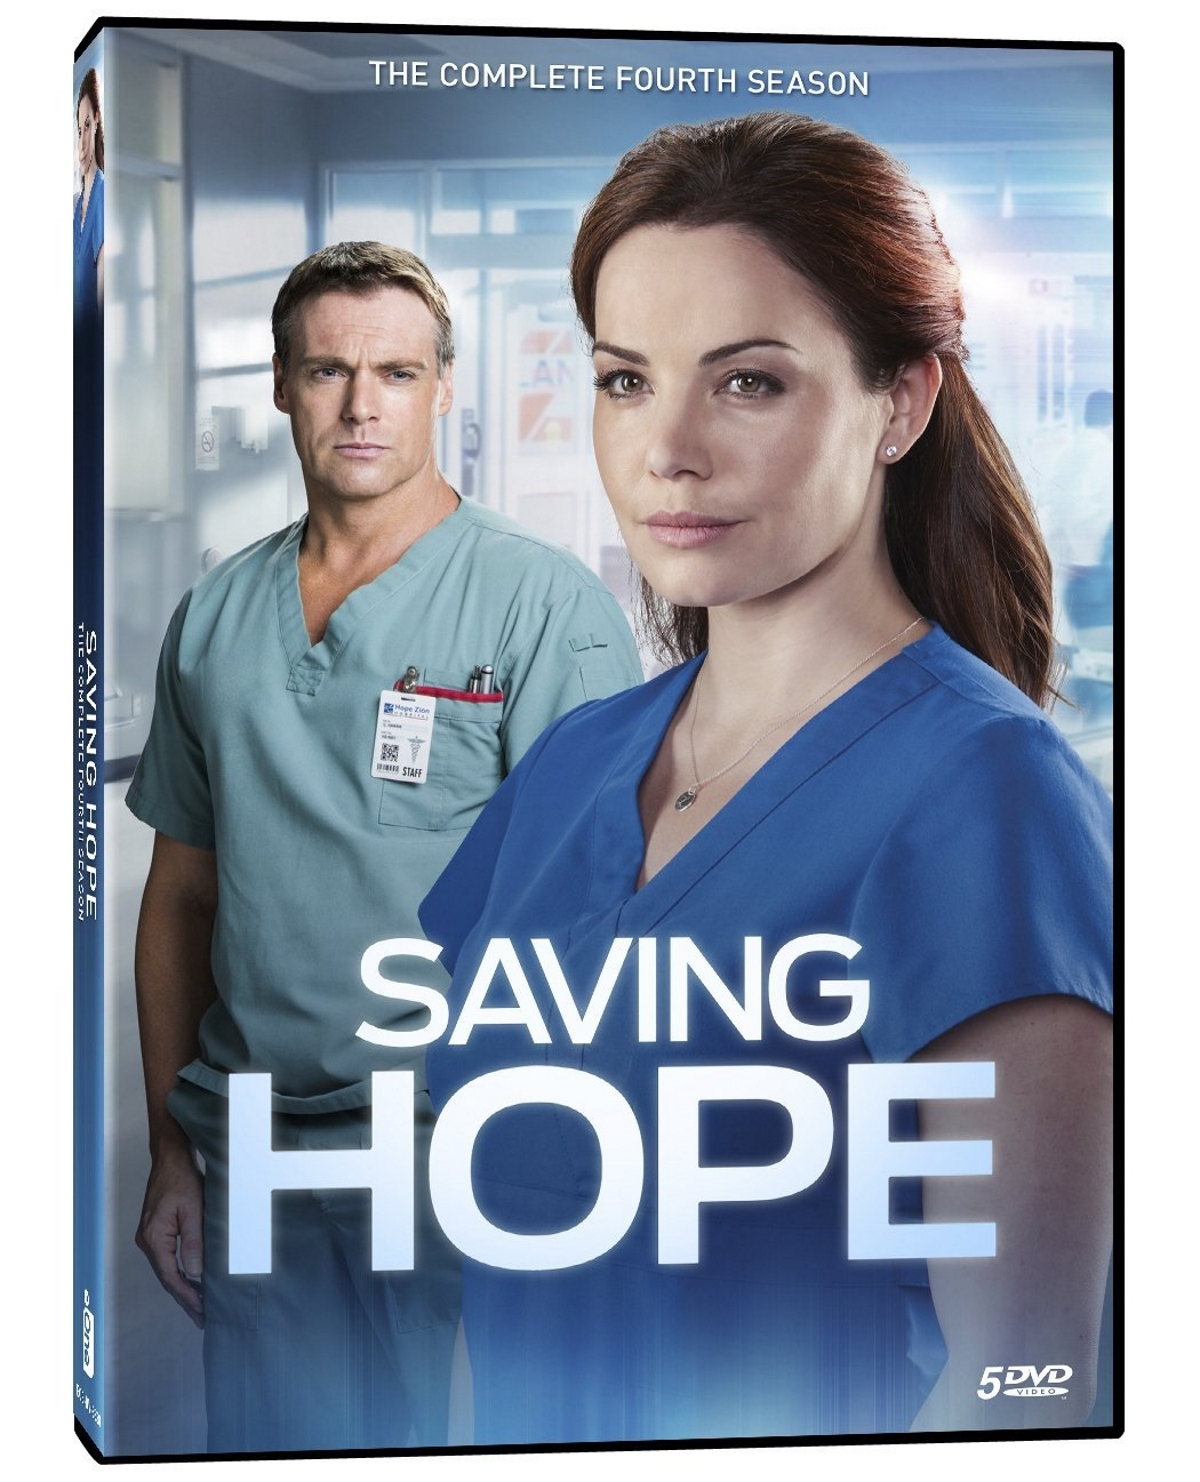 Saving hope fourth season 4  dvd 2017 4 disc    slip cover